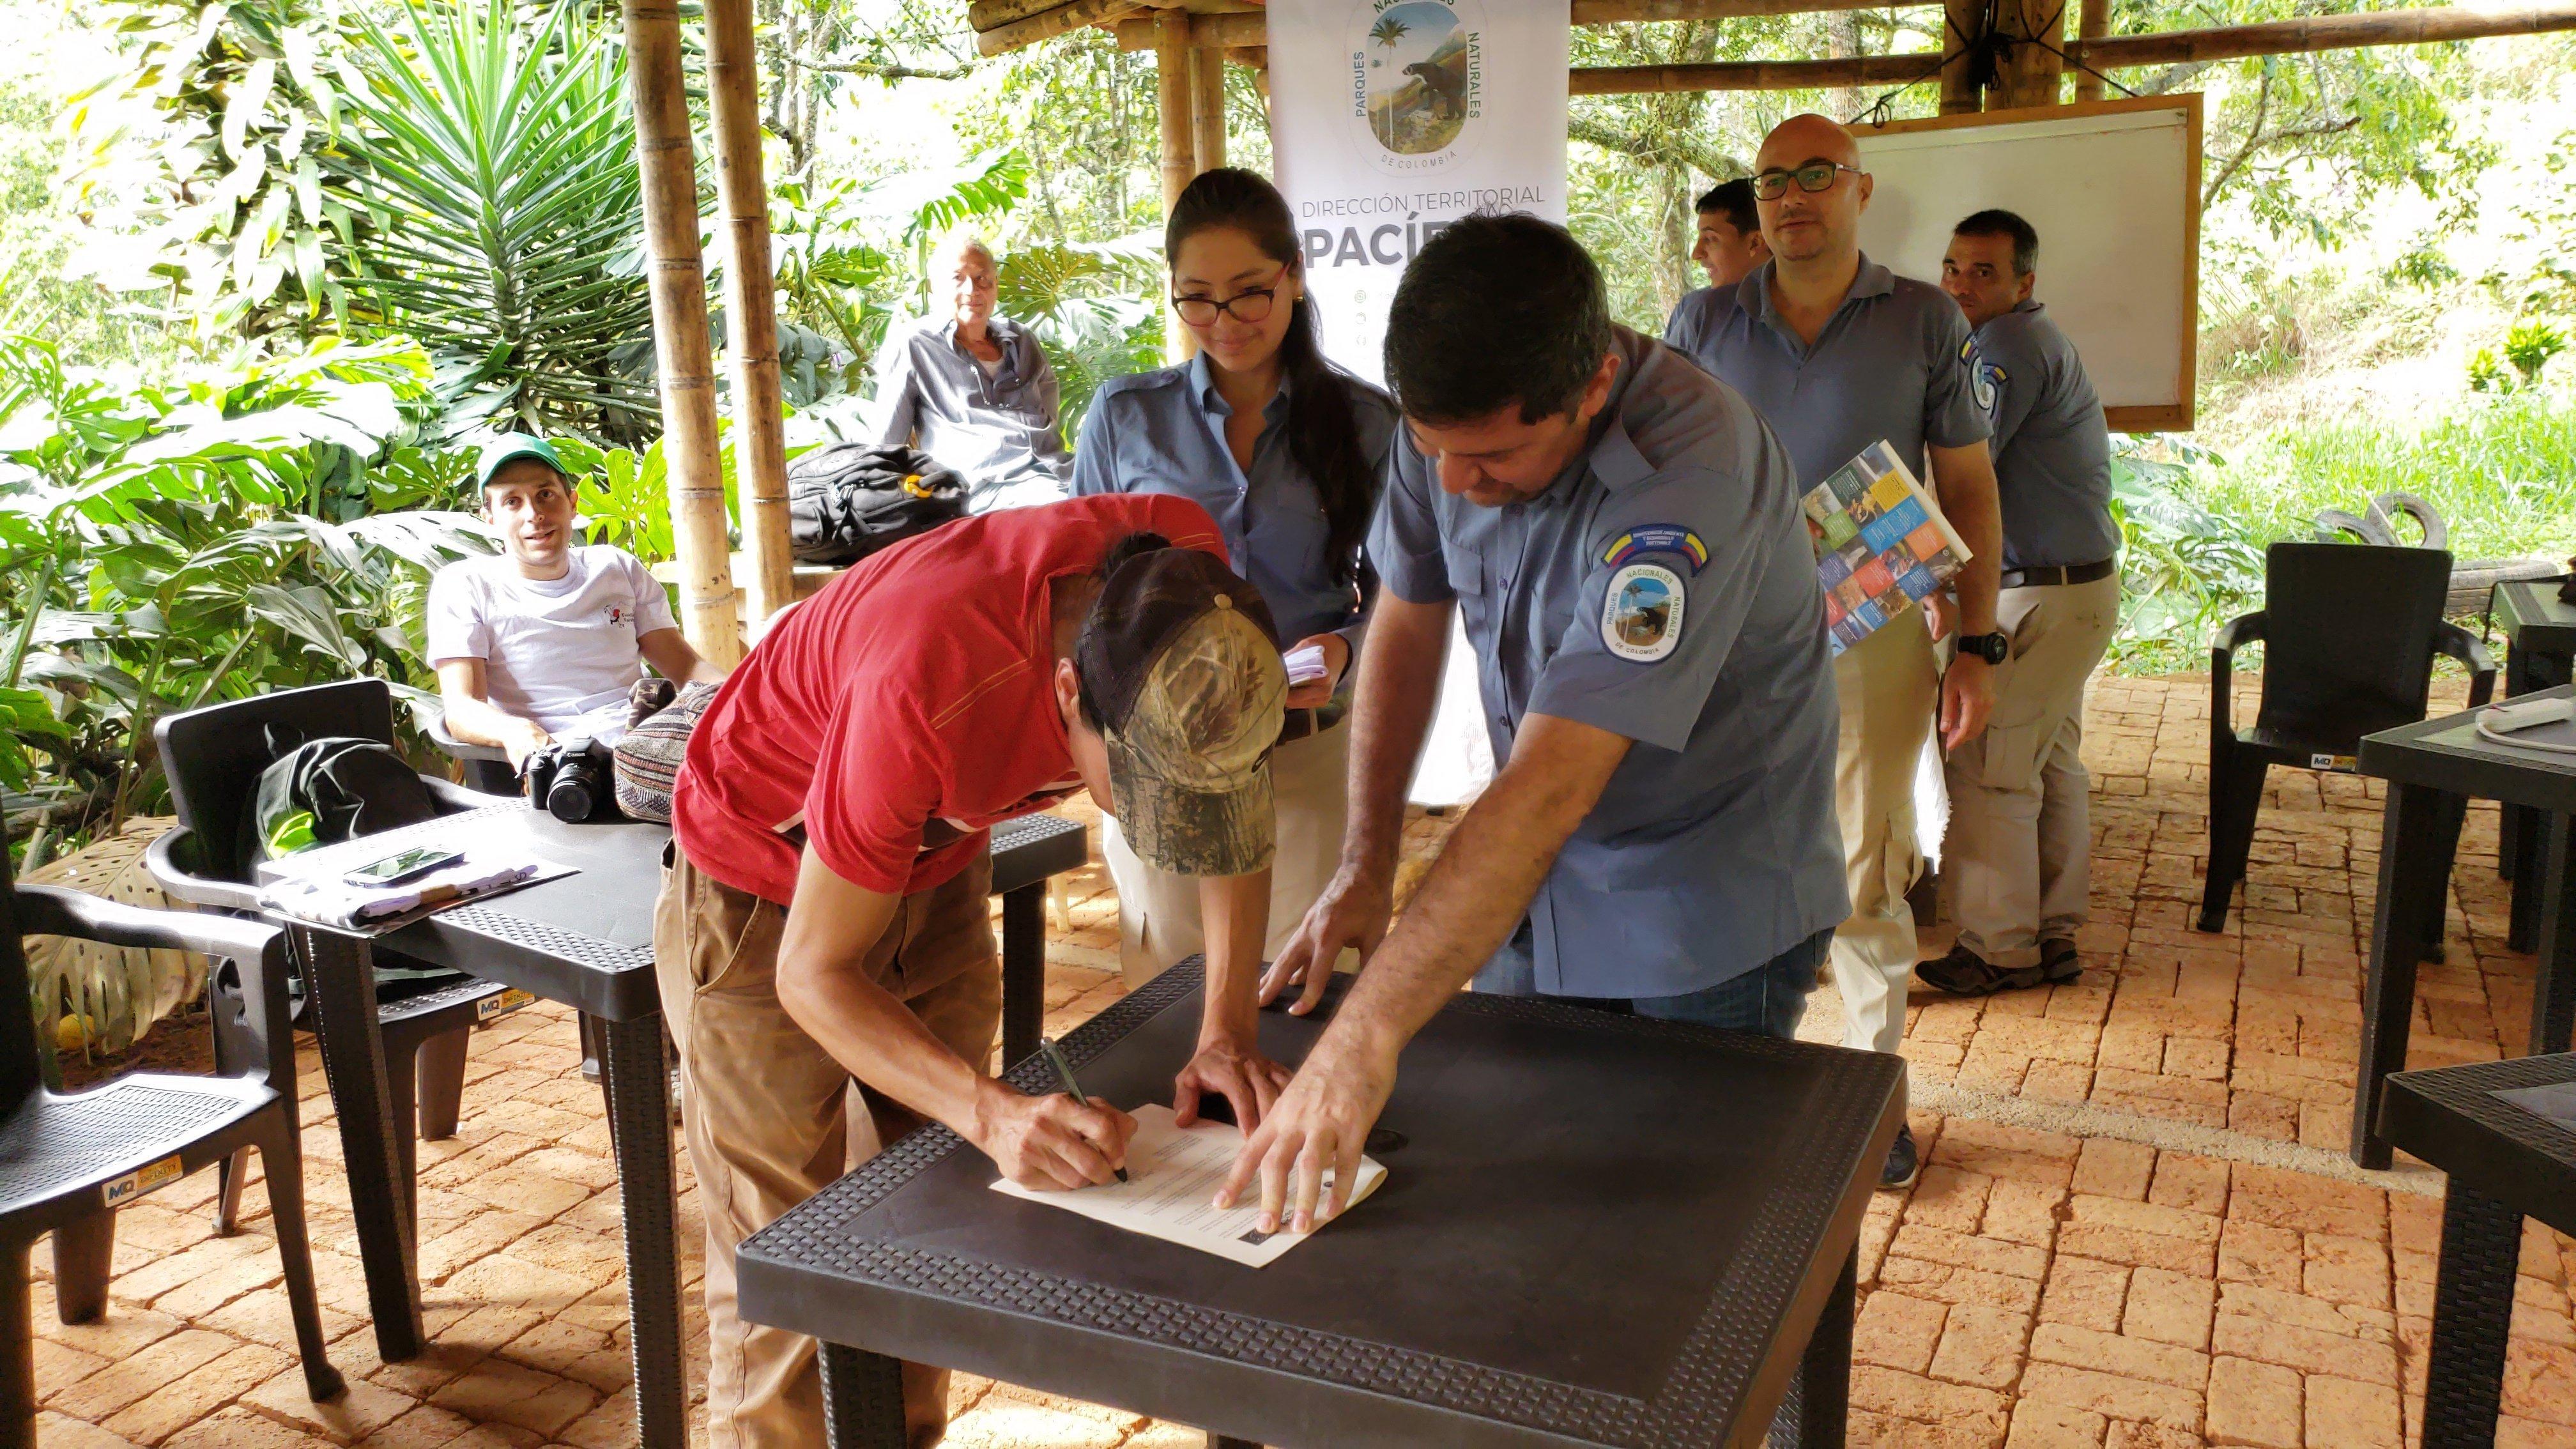 Campesinos firman 21 acuerdos de restauración ecológica para la conservación del Parque Nacional Natural Farallones de Cali - 20191105_152231